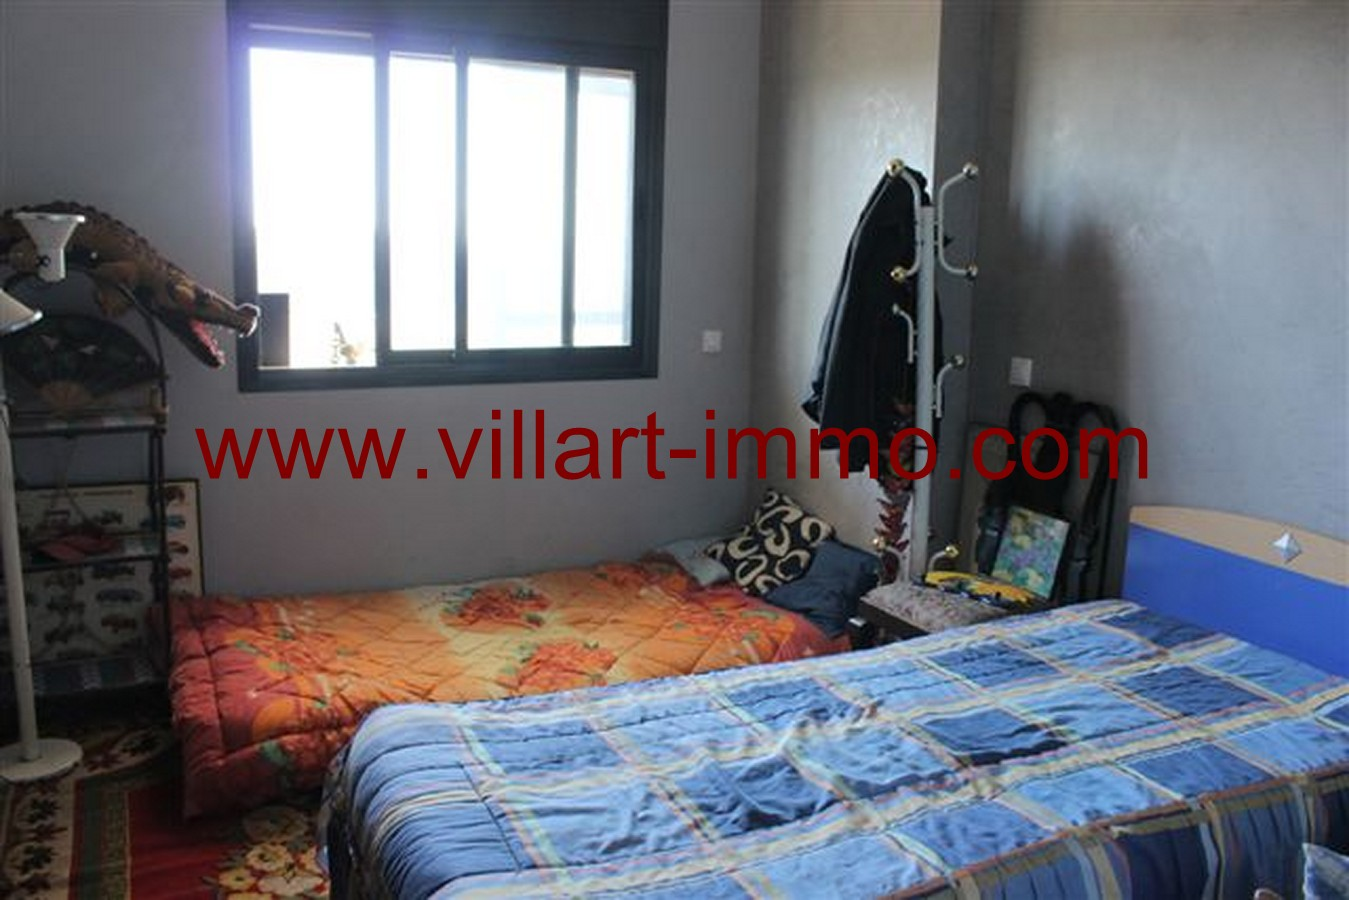 4-Vente-Appartement-Assilah-Autres-Chambre 1-VA49-Villart Immo